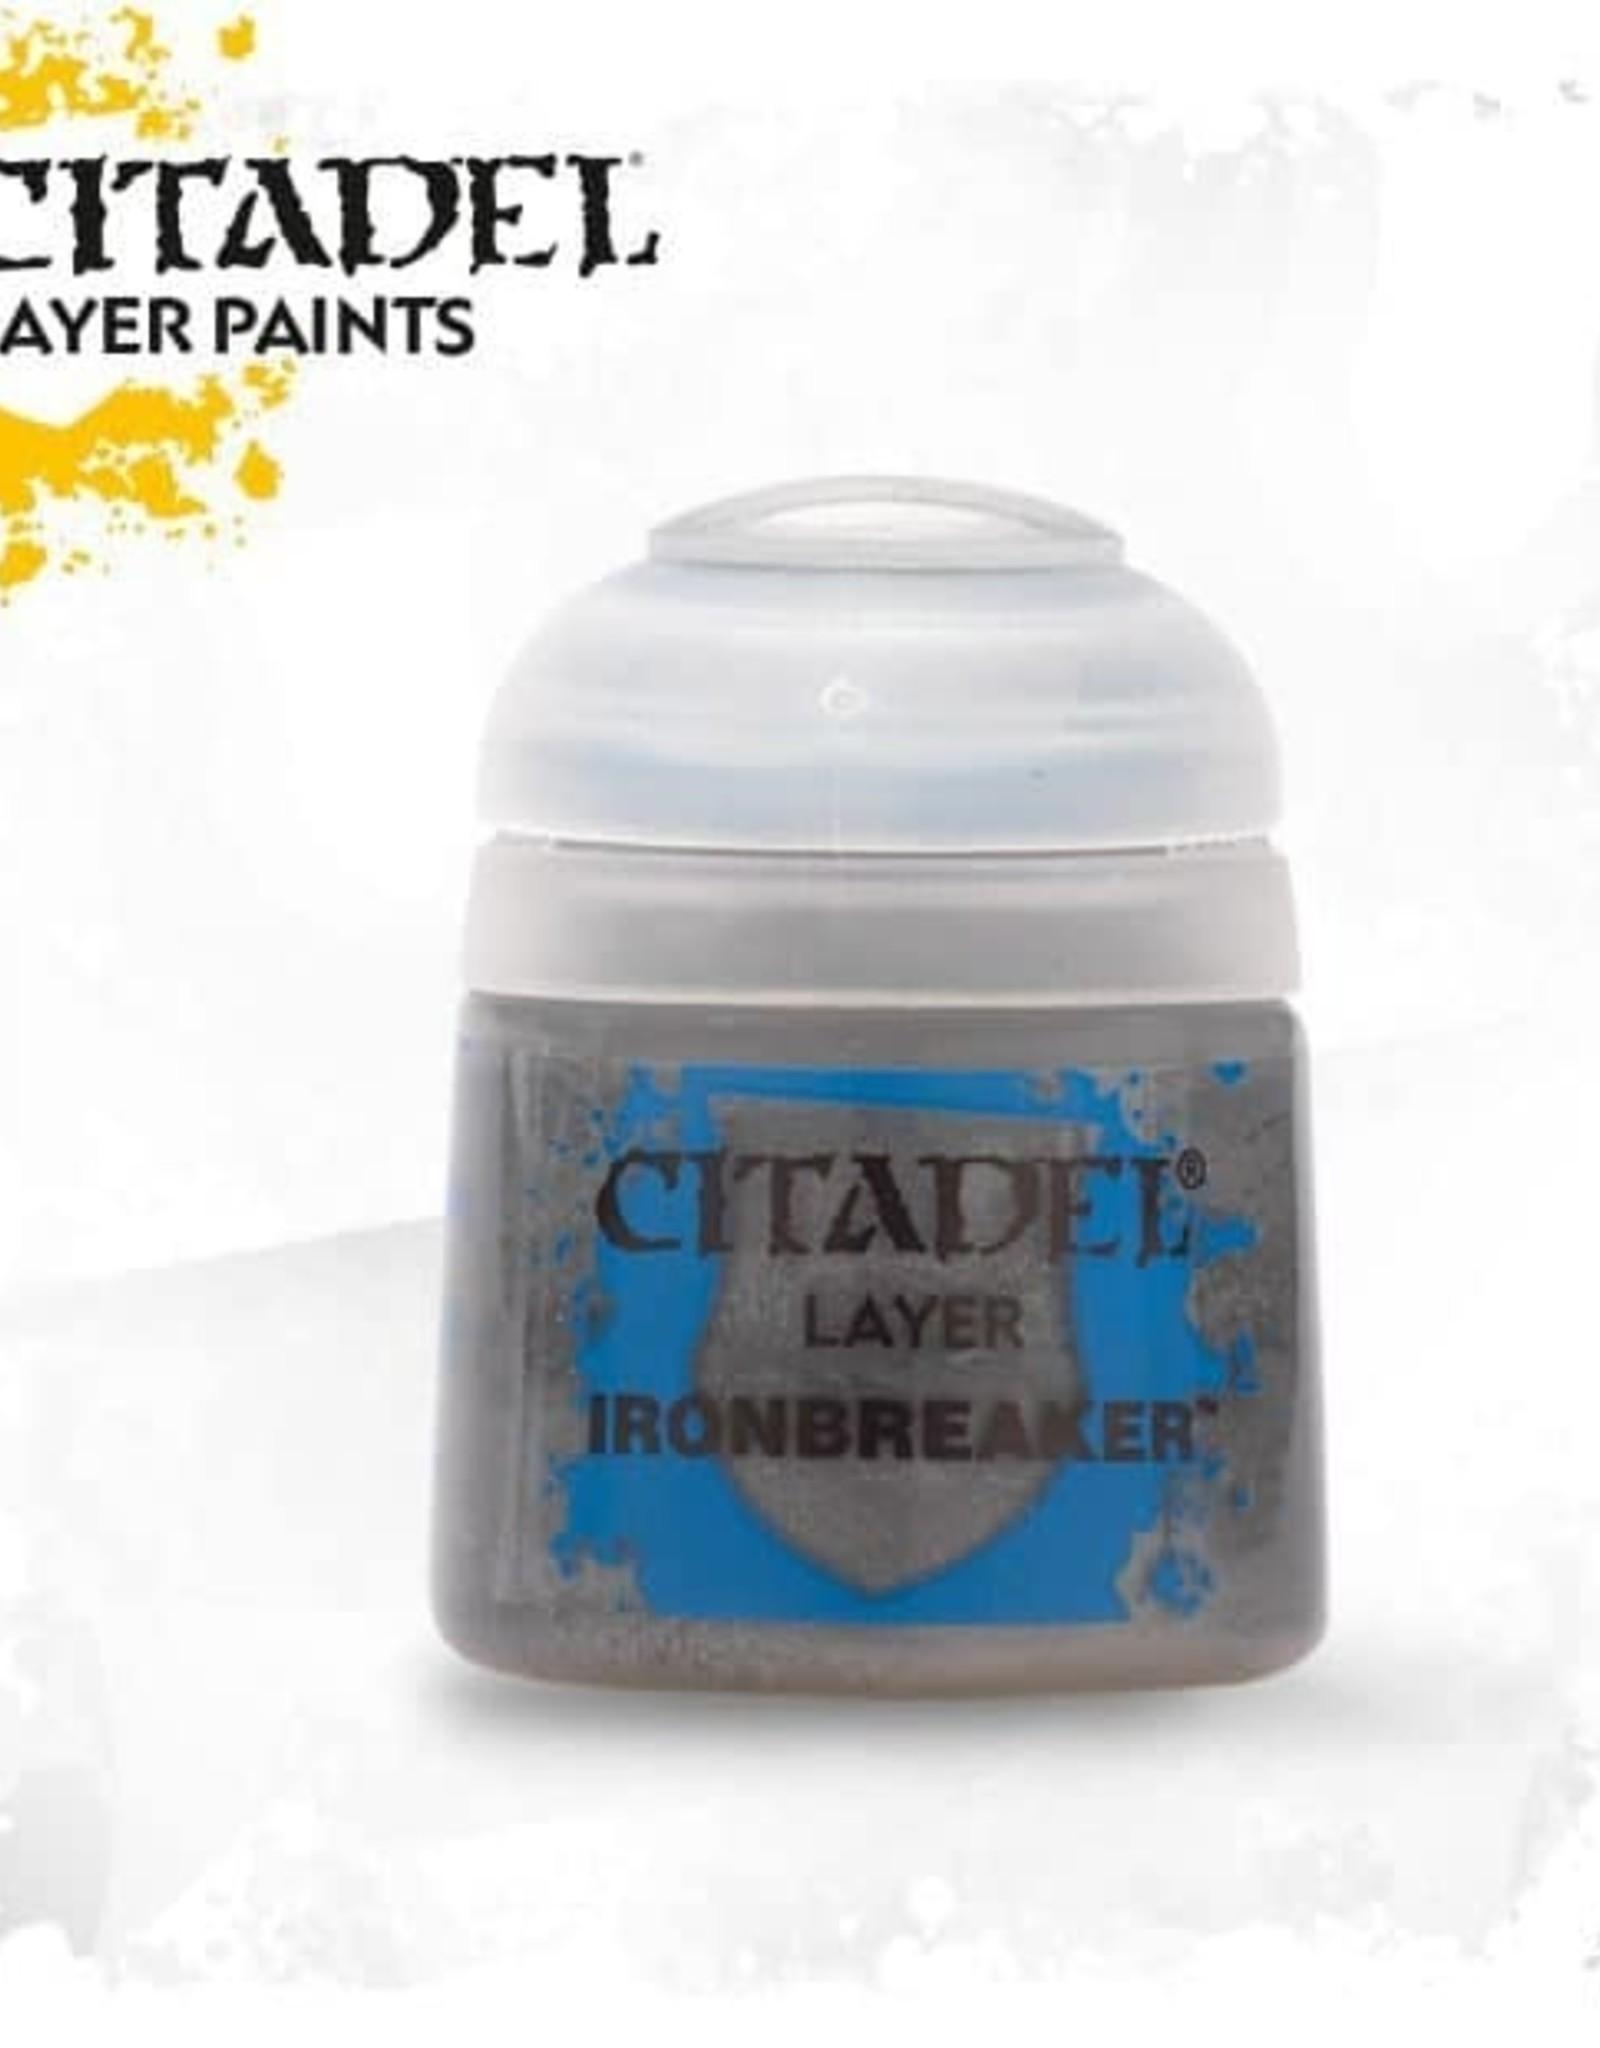 Games Workshop Citadel Paint: Layer - Ironbreaker